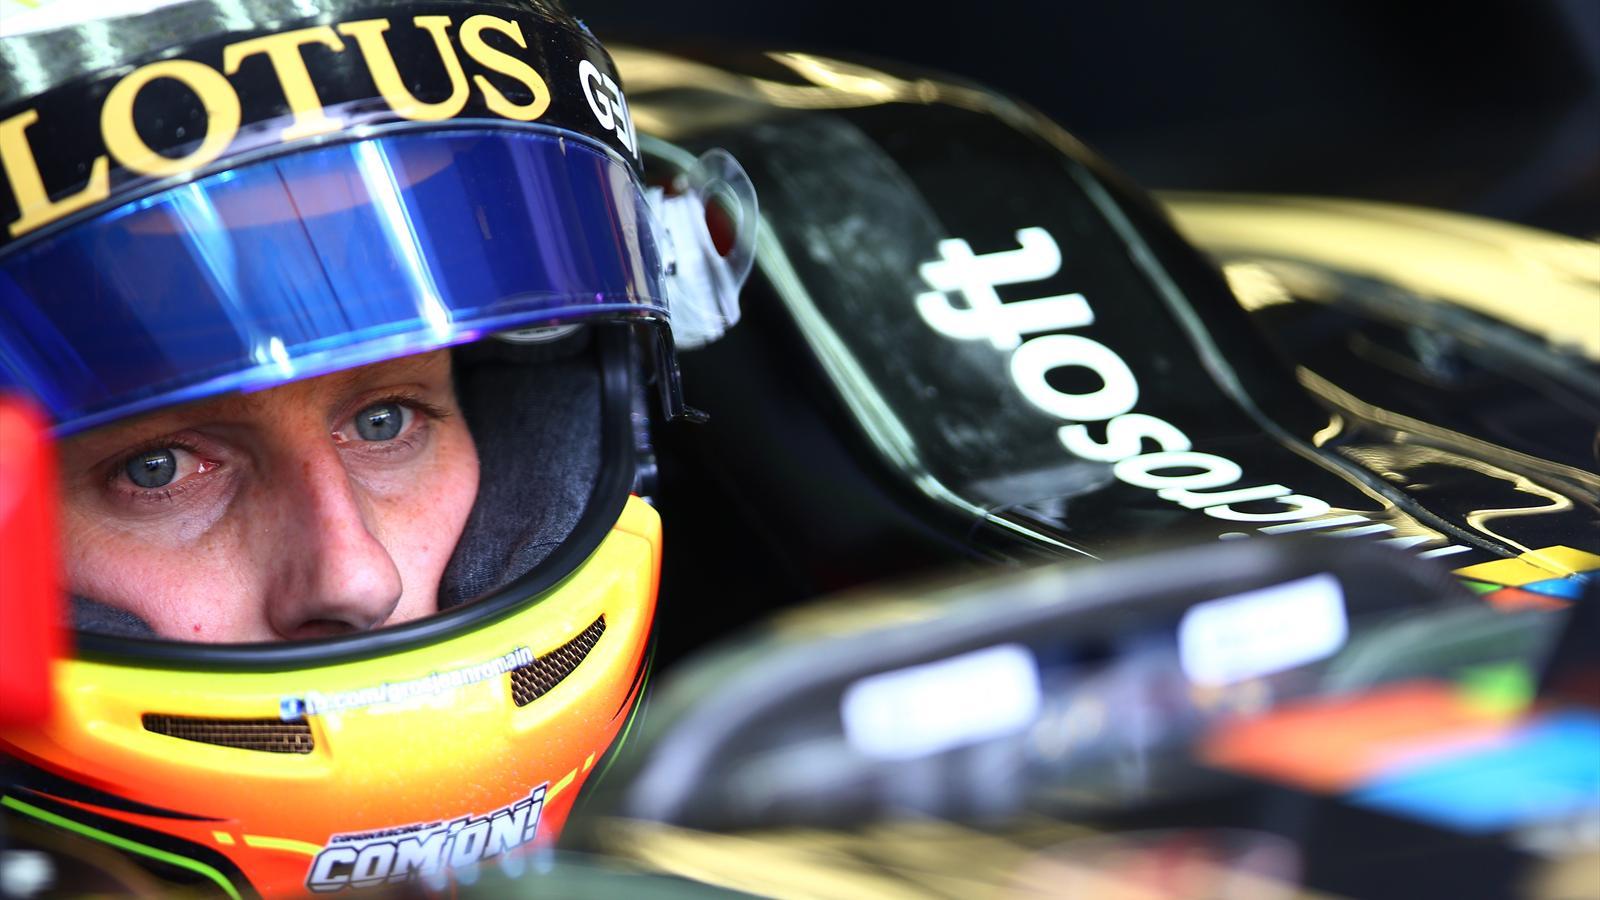 Romain Grosjean (Lotus) - GP of Canada 2015